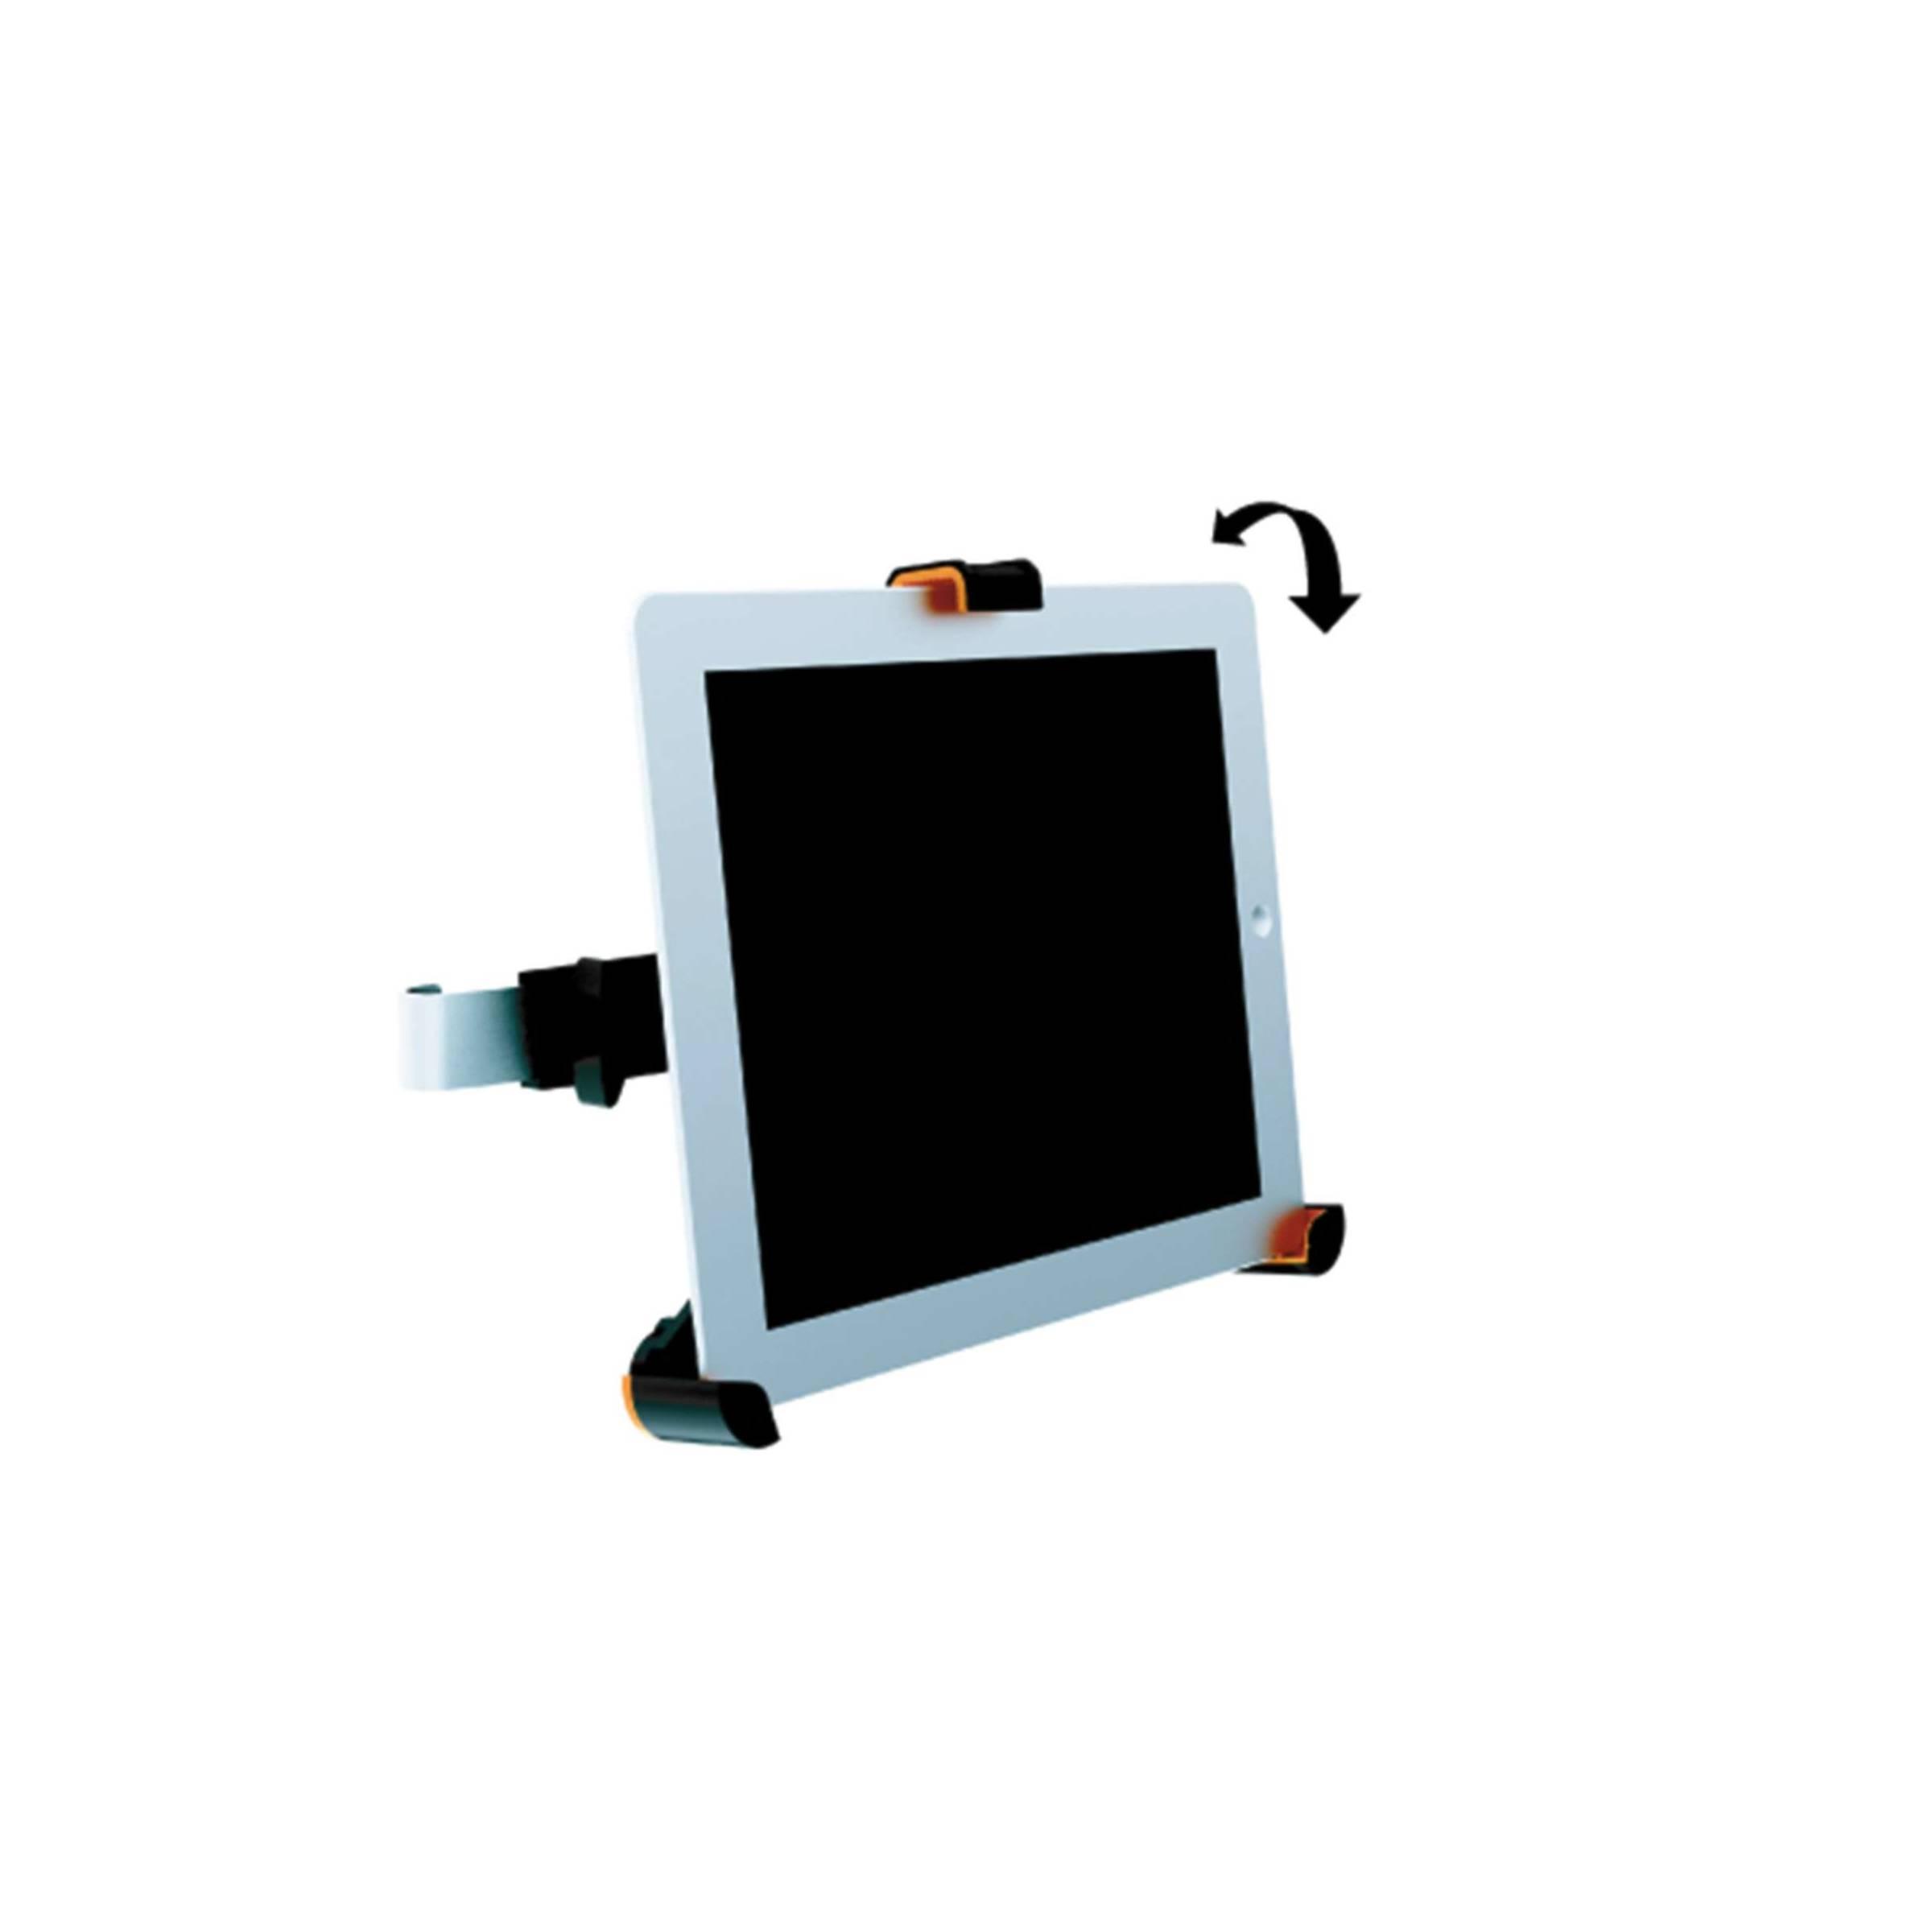 connectech by sinox – Sinox tablet/ipad mount nakkestøtten til bilen fra mackabler.dk